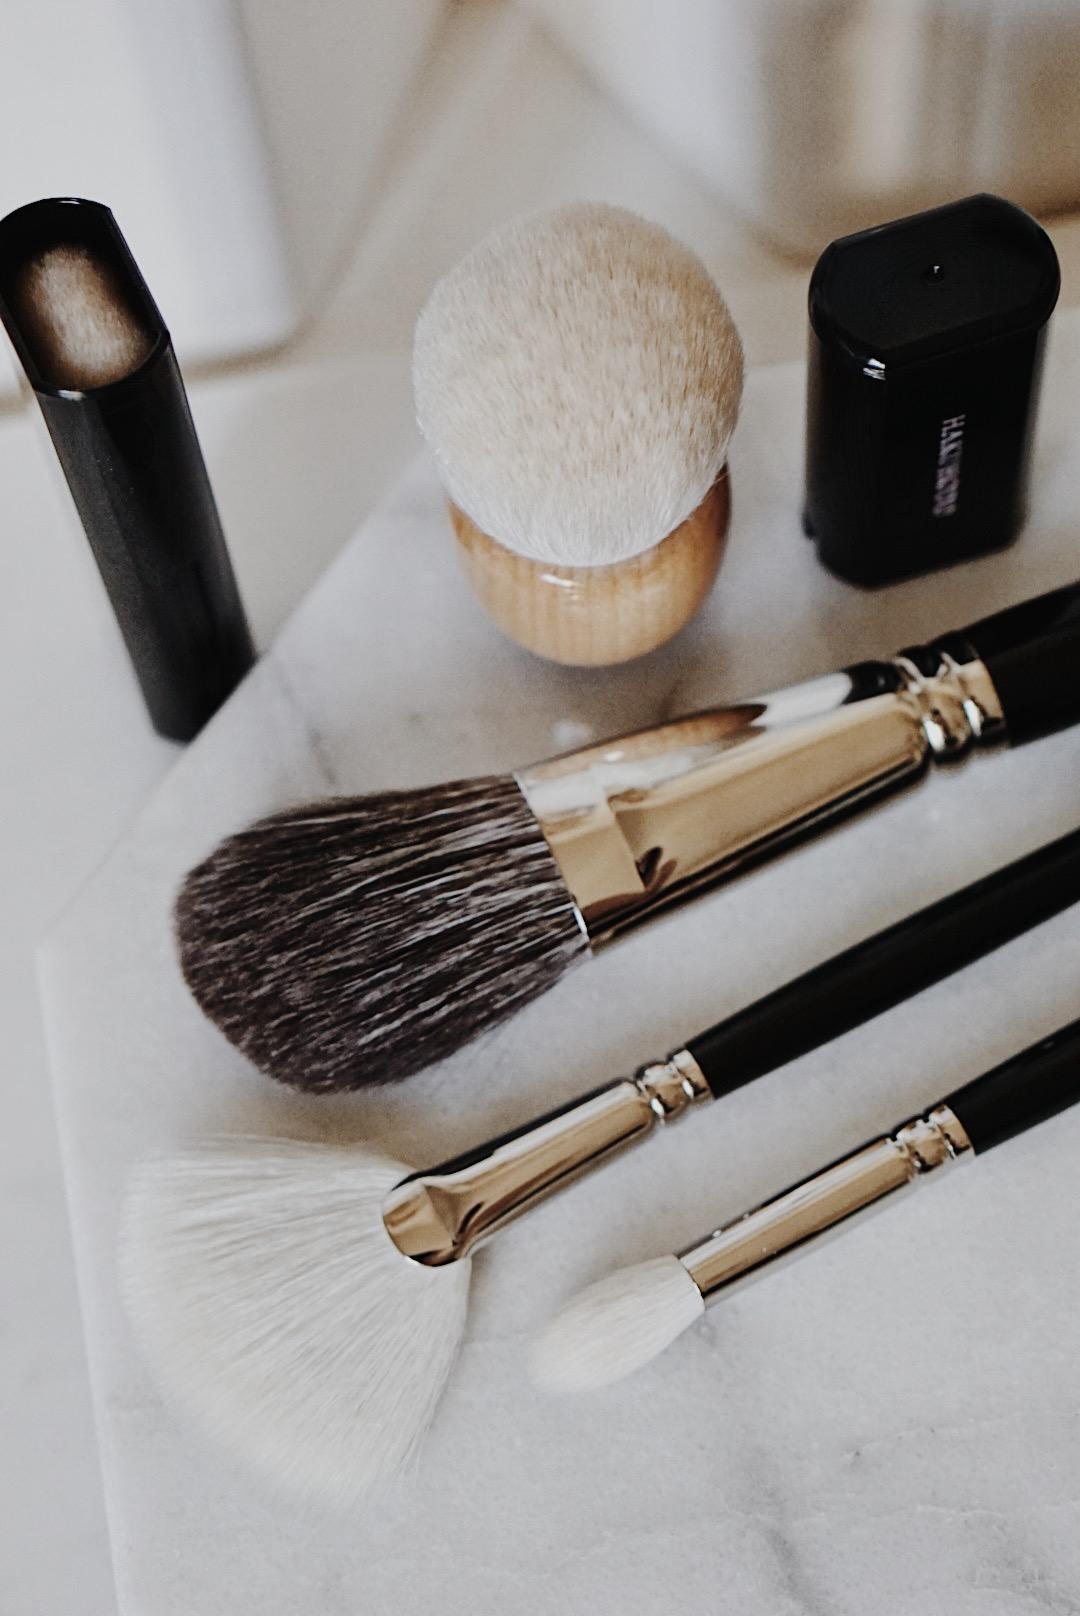 Hakuhodo Brushes J5522 J4004 Powdered Angle Brush Slide Face Angled Maple Kinoko Brush